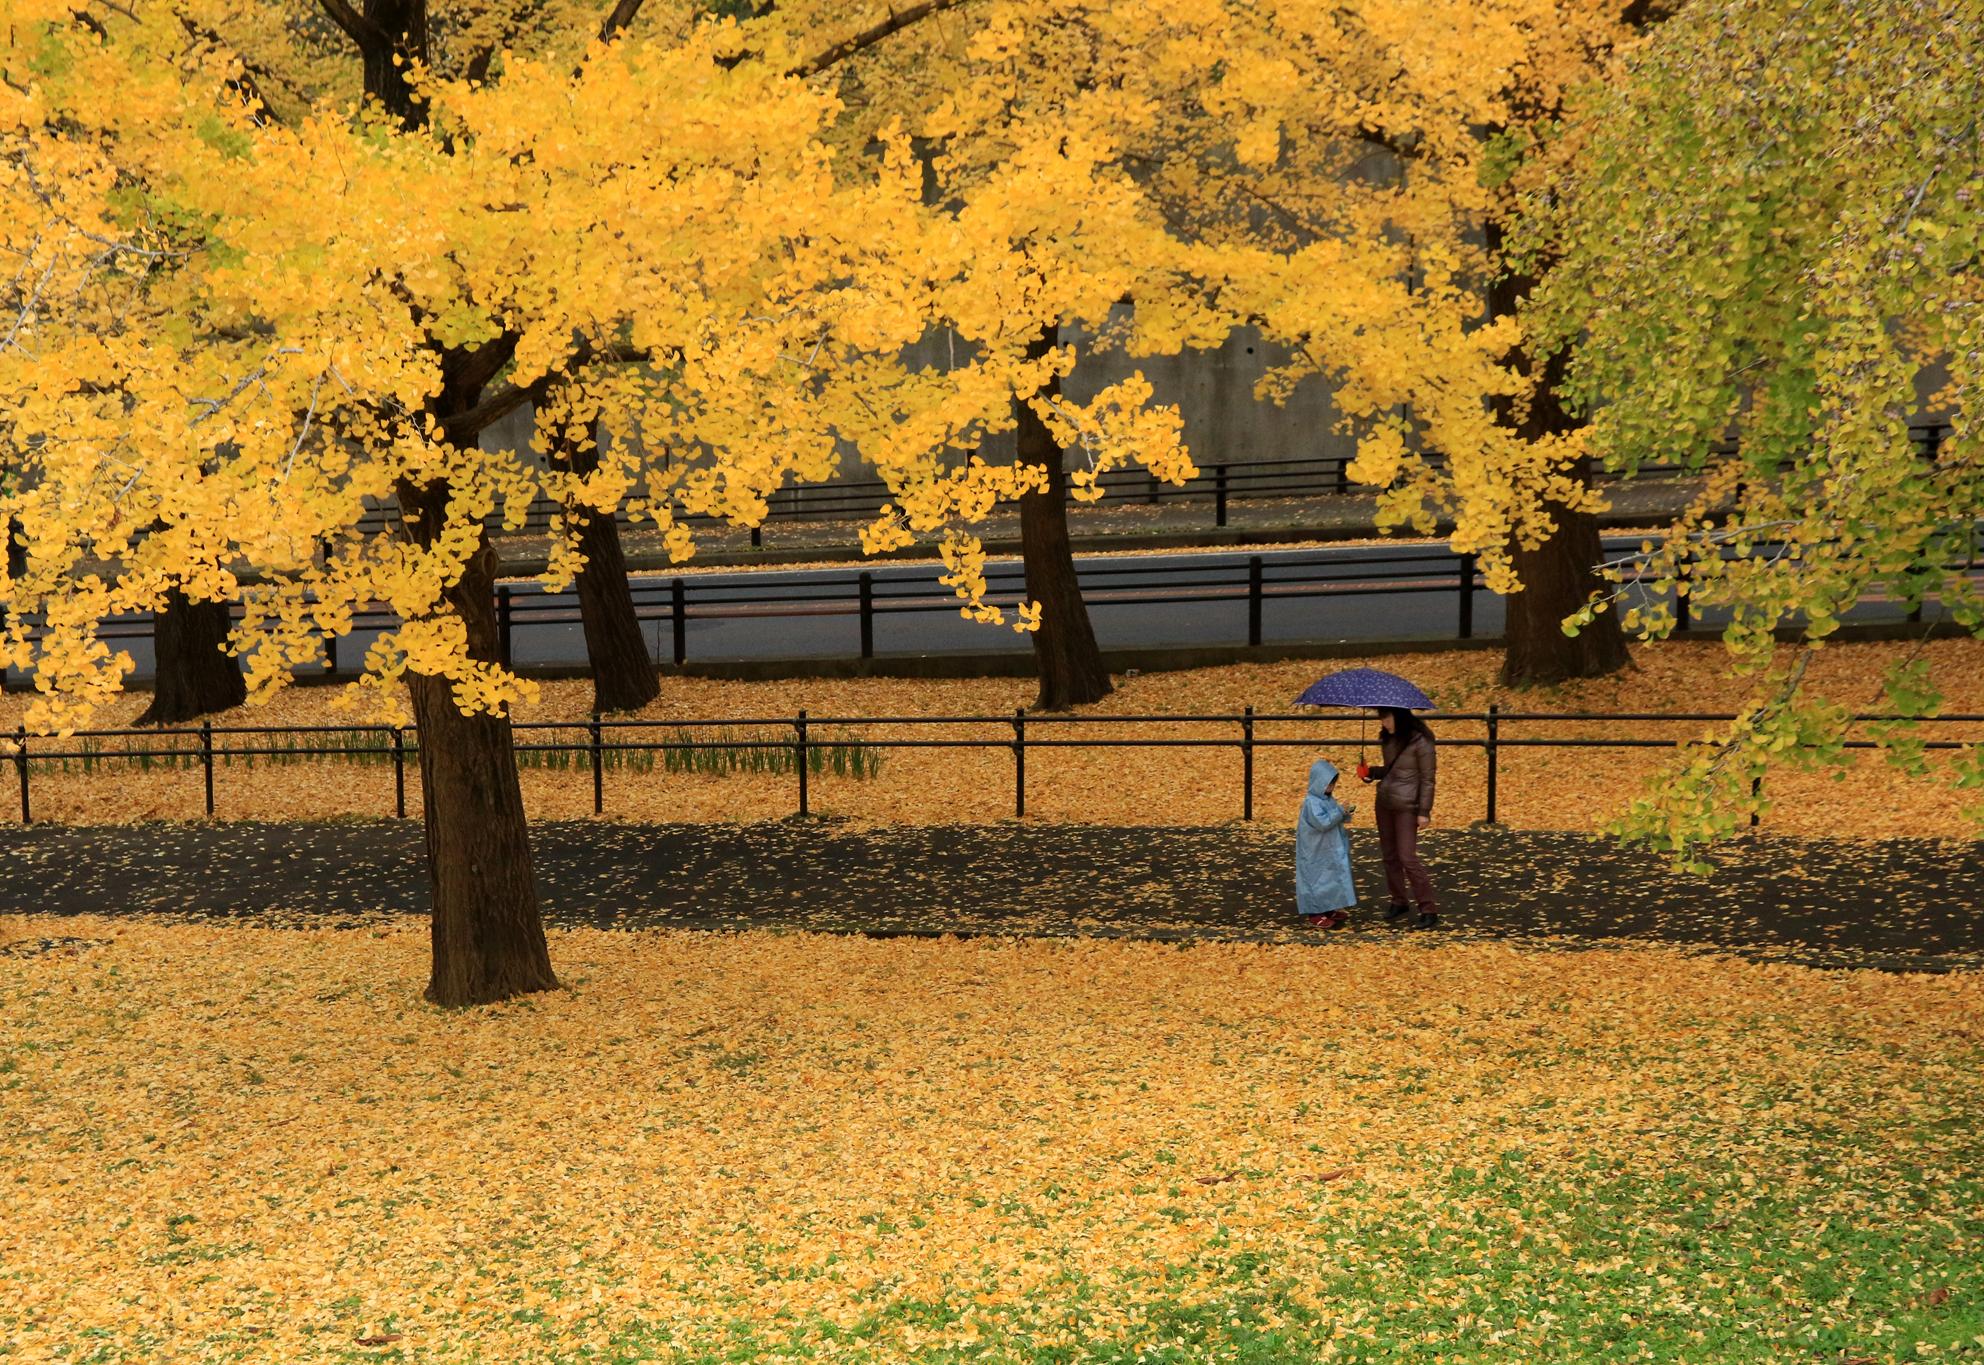 IMG_8468-2_第10回(公財)神奈川県公園協会 花とみどりのフォトコンテスト_入選_秋雨の小道.jpg